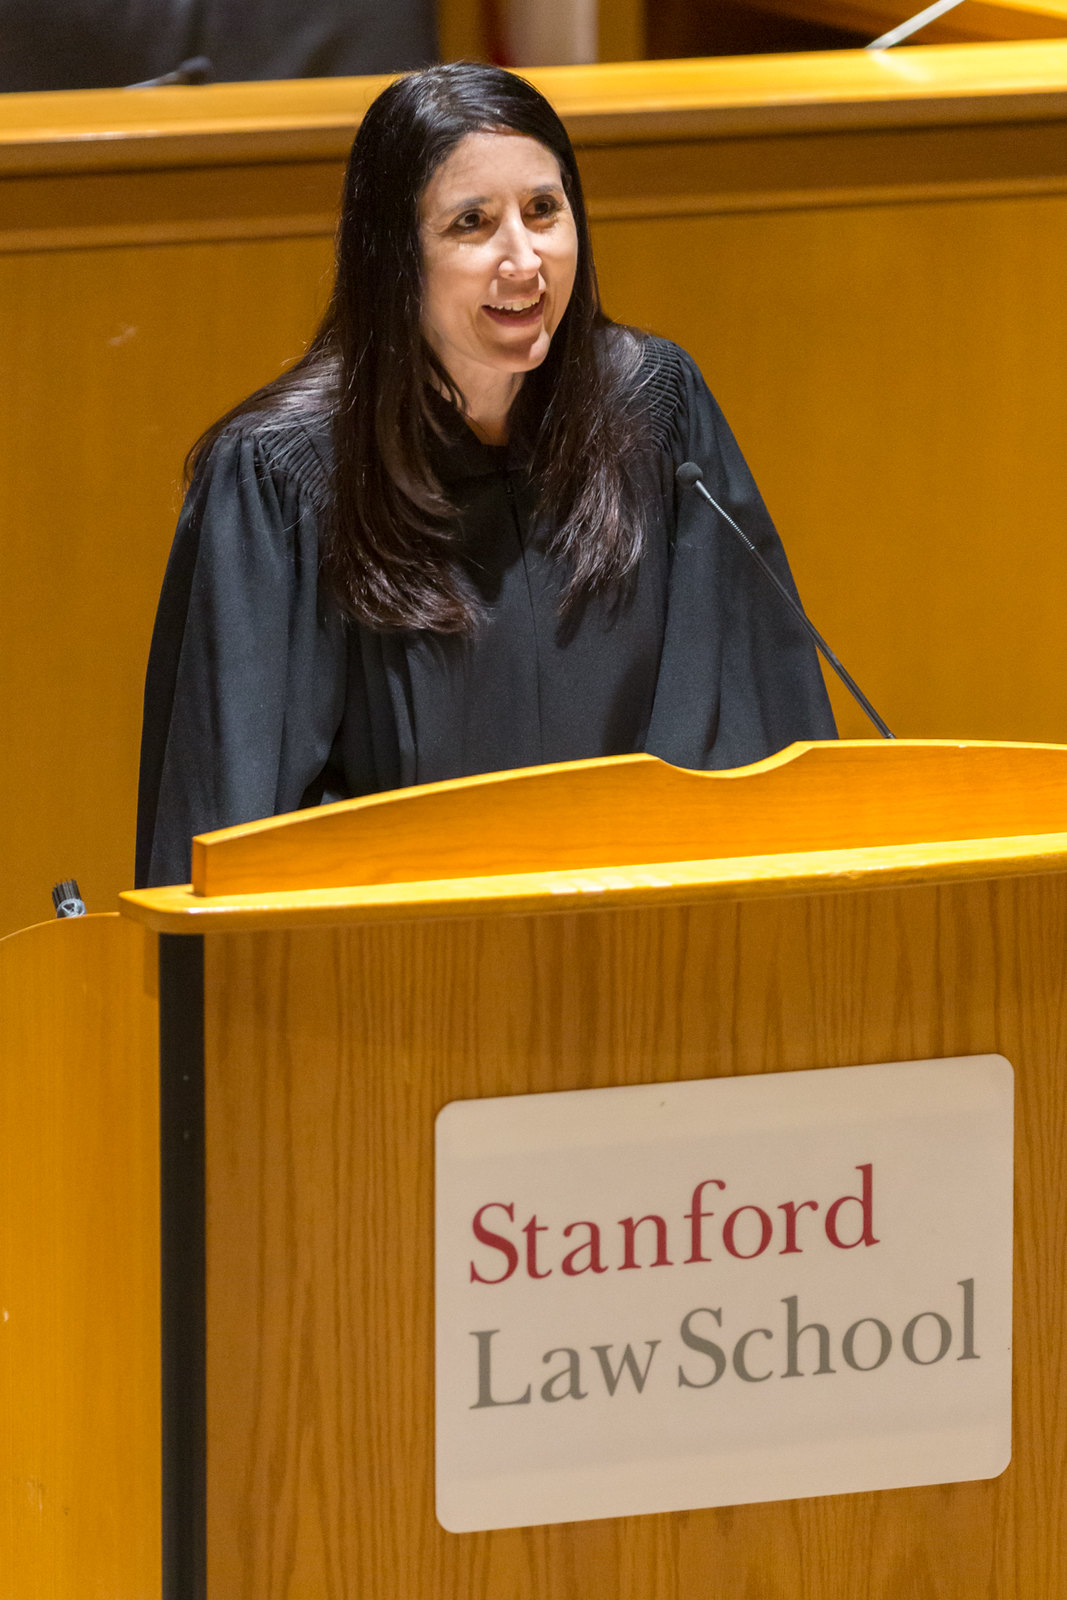 Stanford Law | Flickr